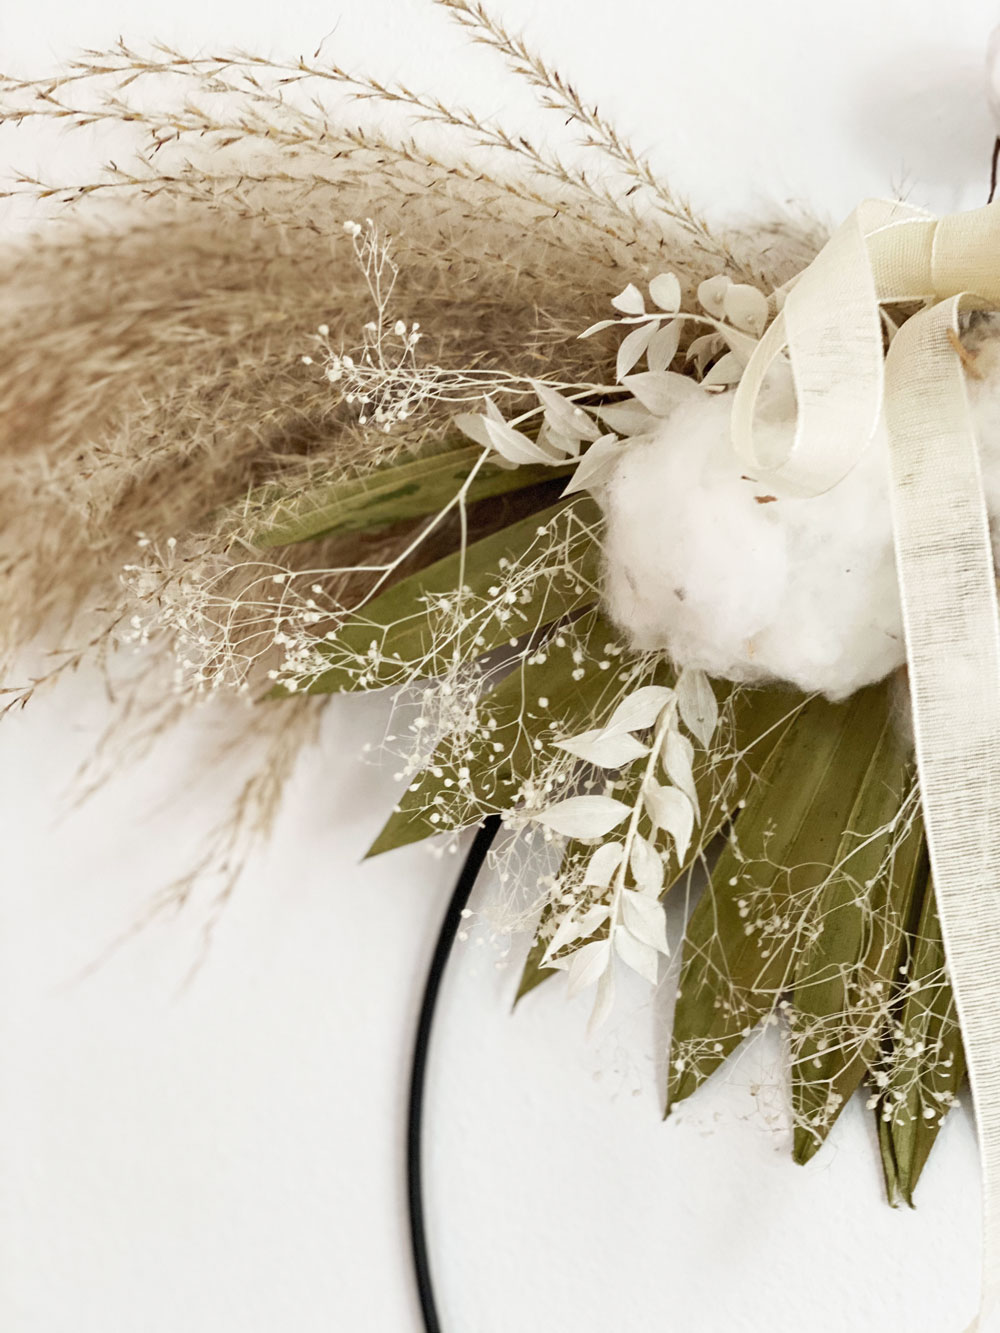 Dried Floral Wreath - Half Moon